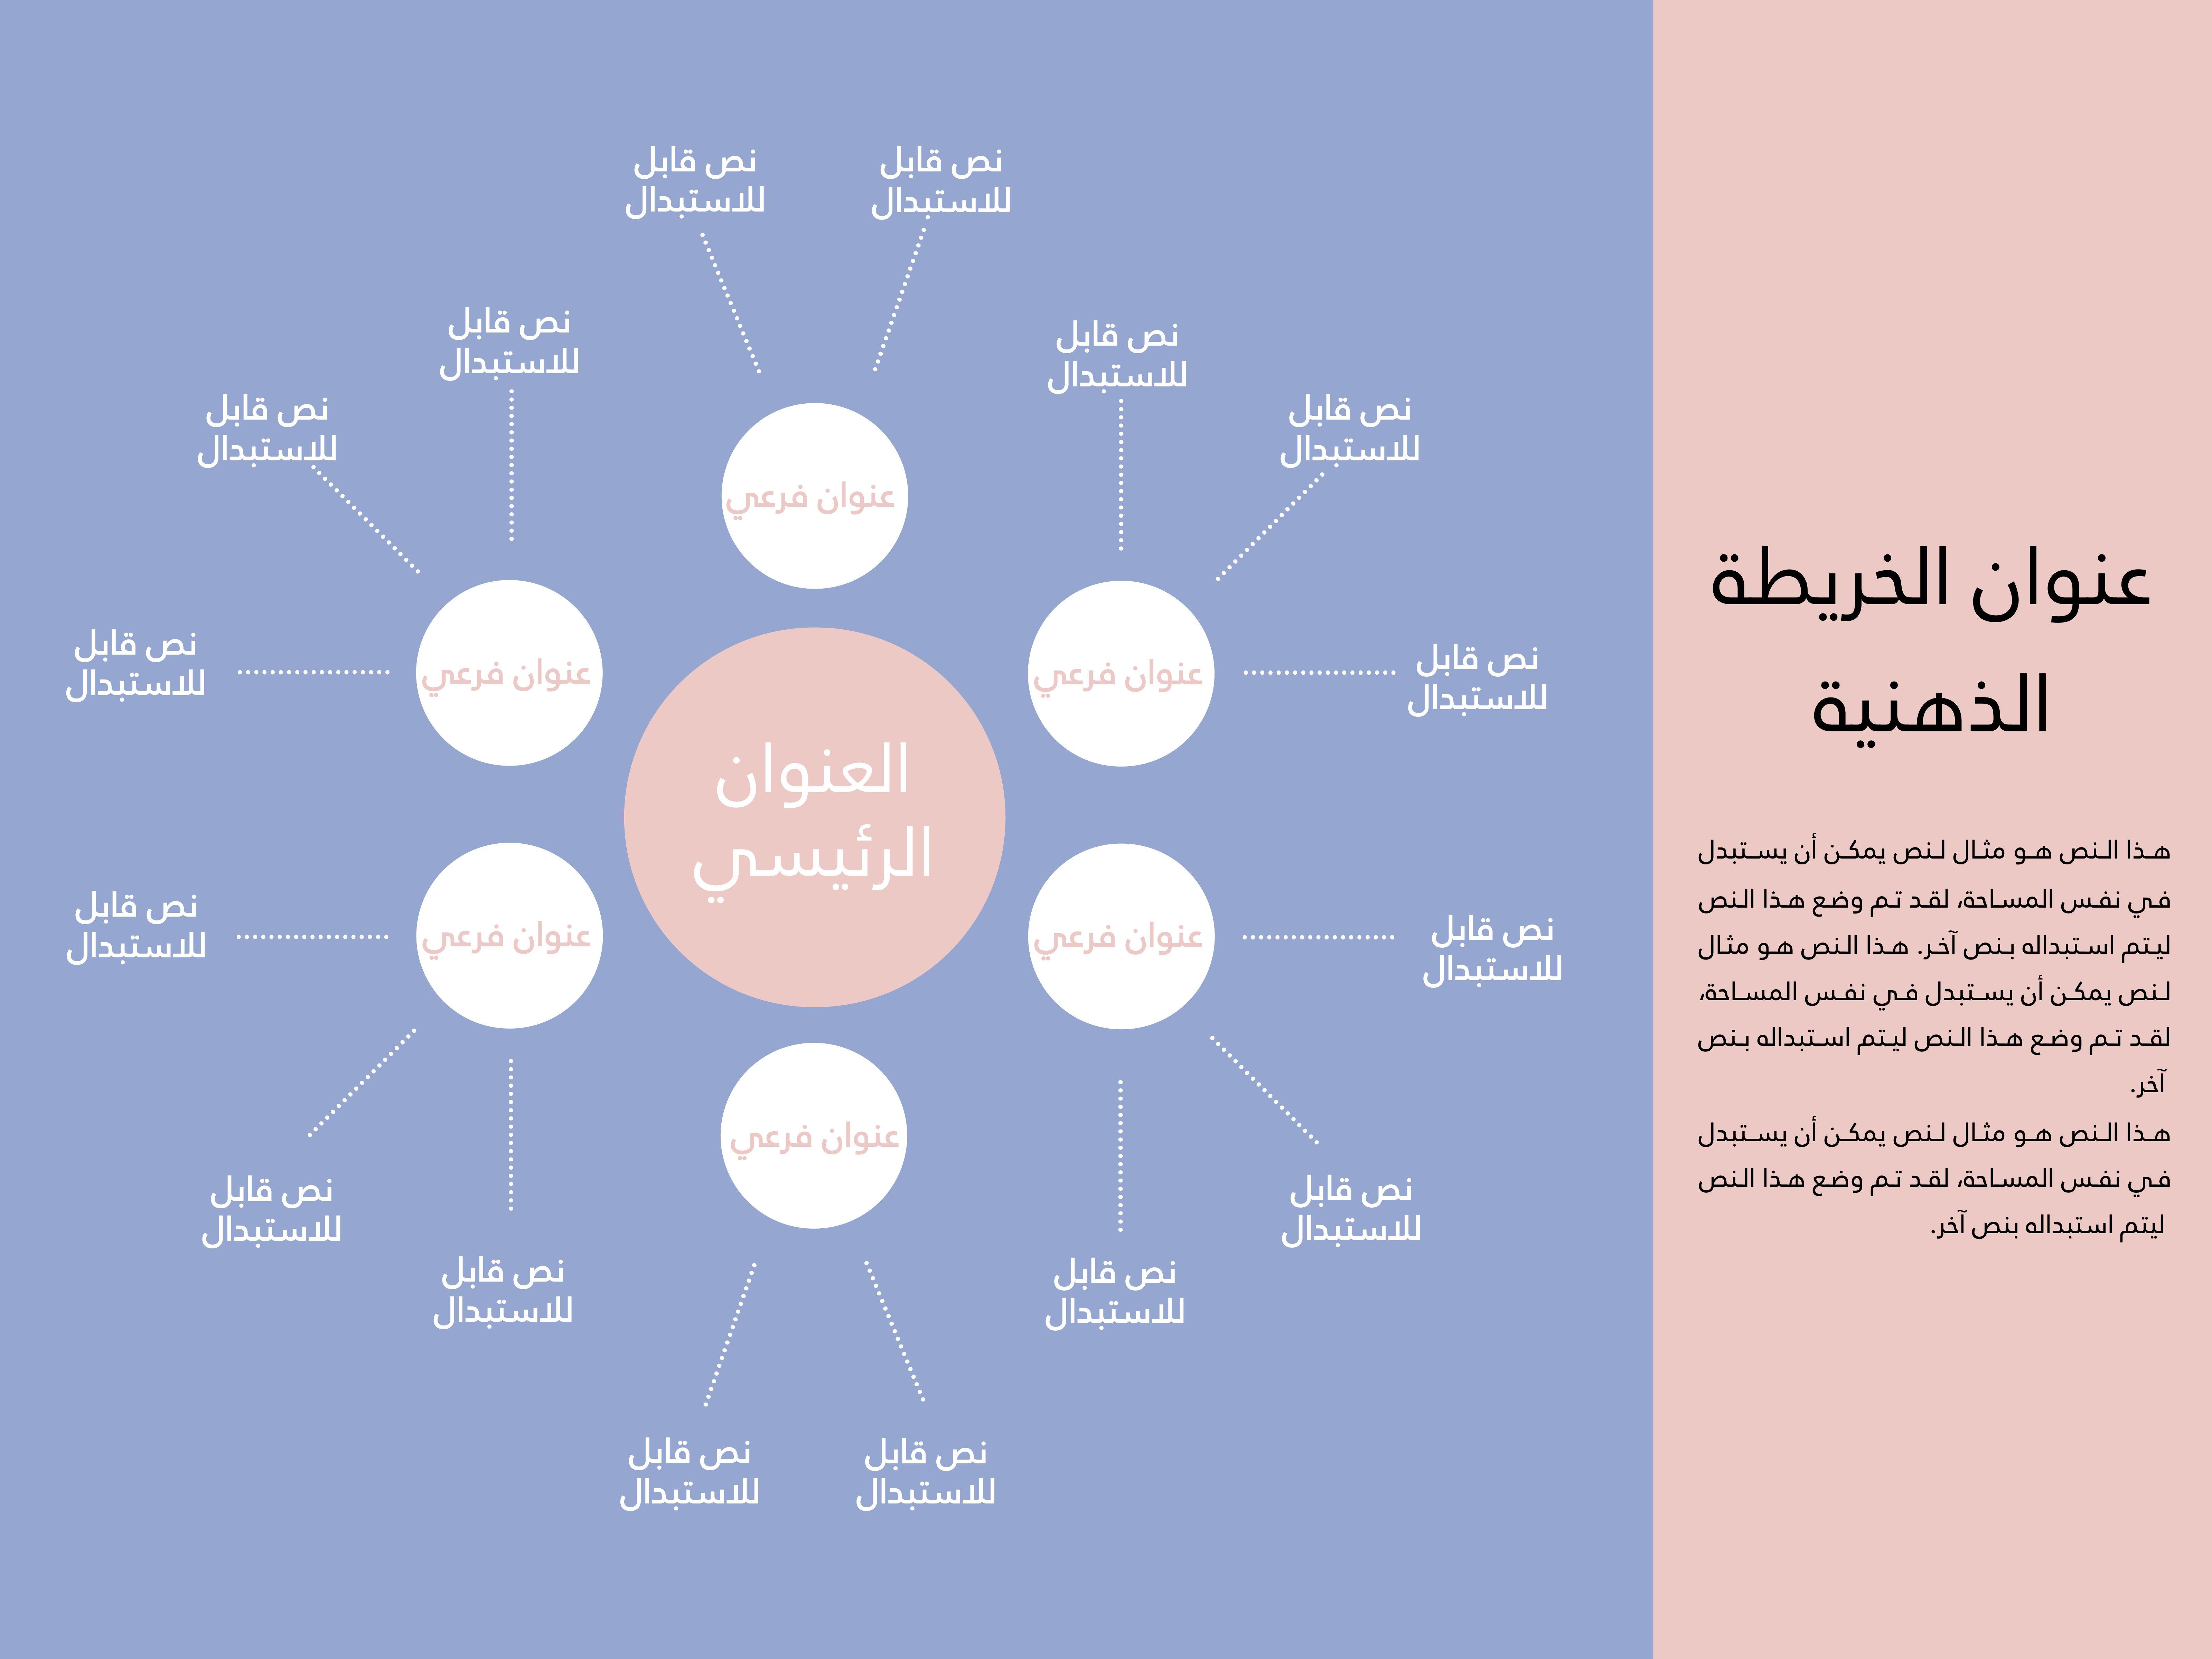 10 قوالب خرائط ذهنية Ideas Arabic Books Baby Education Living Room Design Decor